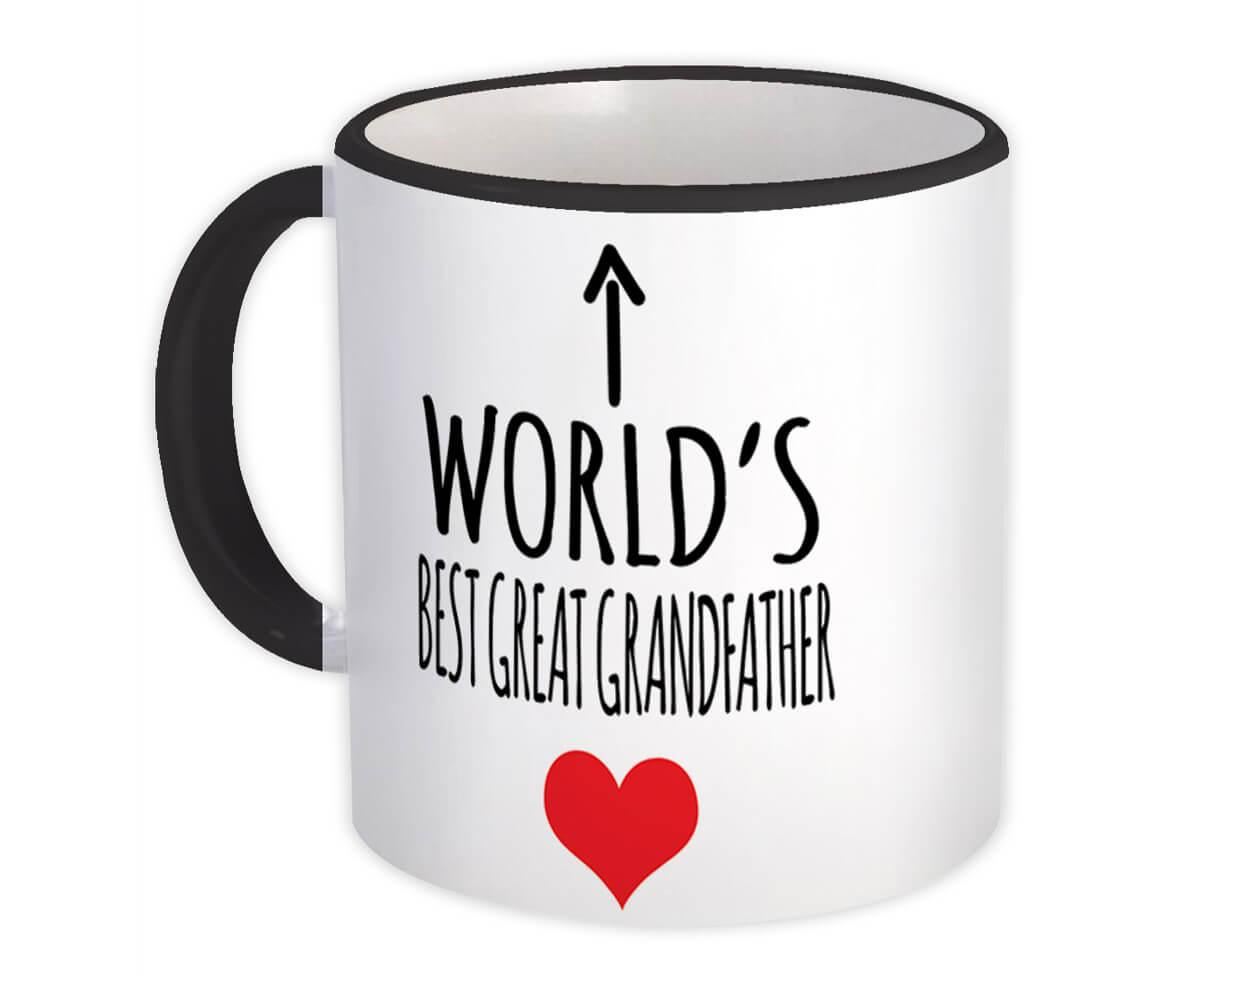 Worlds Best GREAT GRANDFATHER : Gift Mug Love Family Work Christmas Birthday